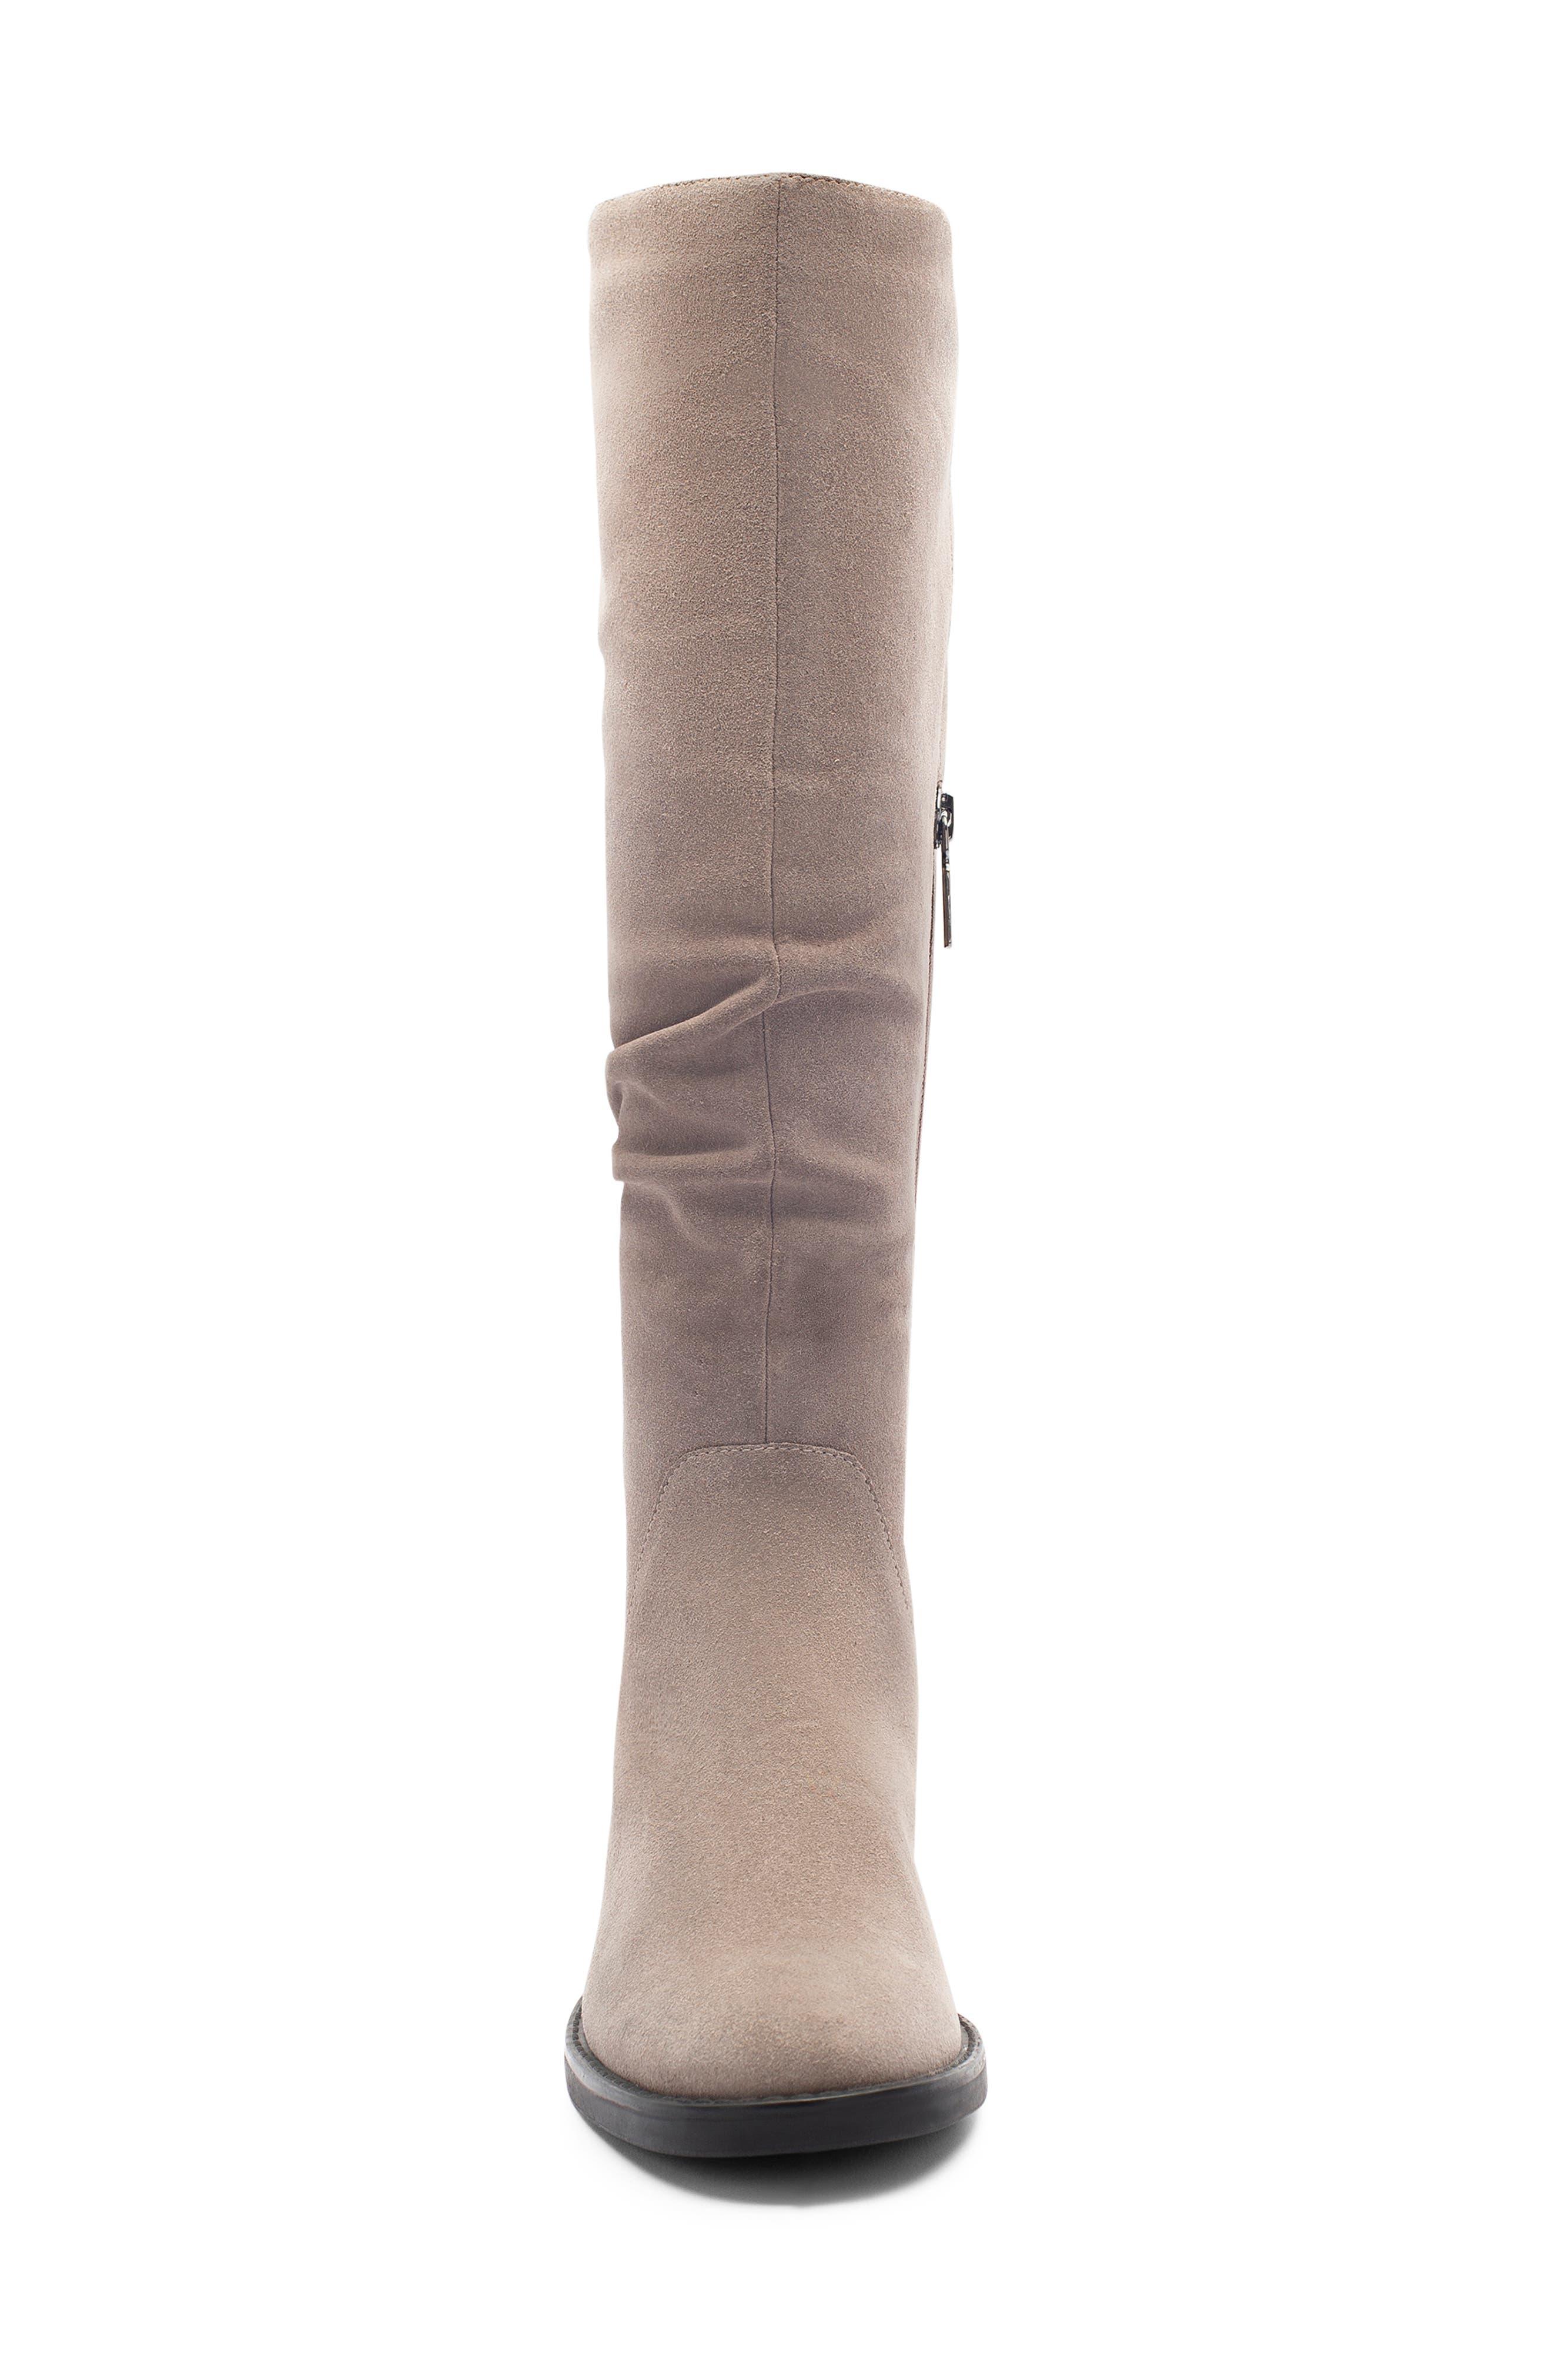 BLONDO, Erika Waterproof Knee High Boot, Alternate thumbnail 4, color, DARK TAUPE SUEDE